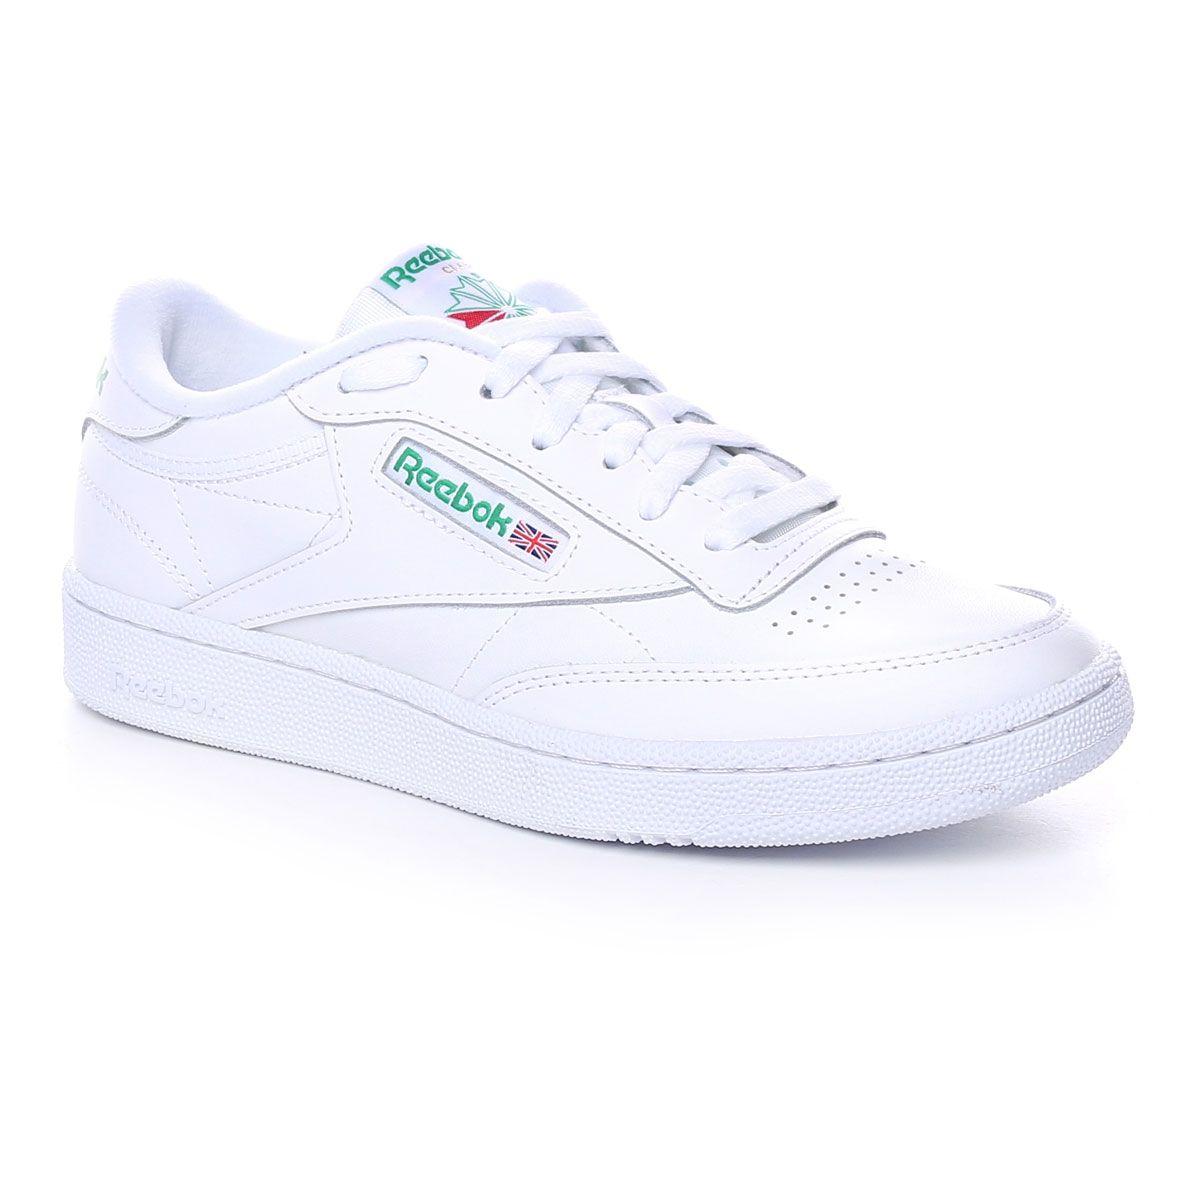 Reebok Club C 85 Uomo Bianco Verde